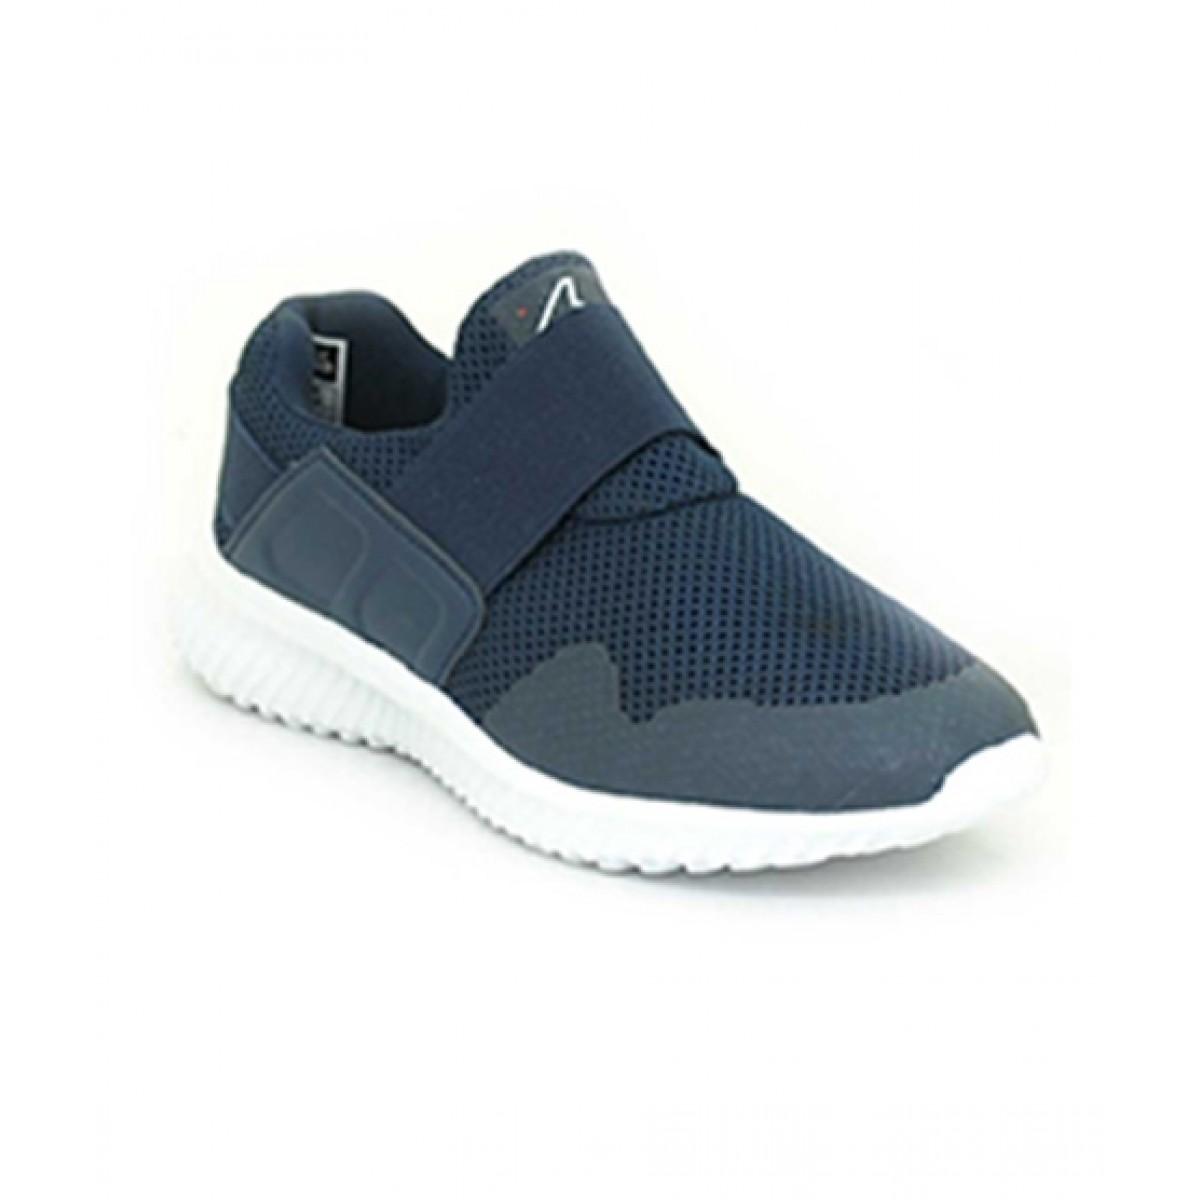 Bata Power Casual Shoes For Men Dark Blue (408-9032)